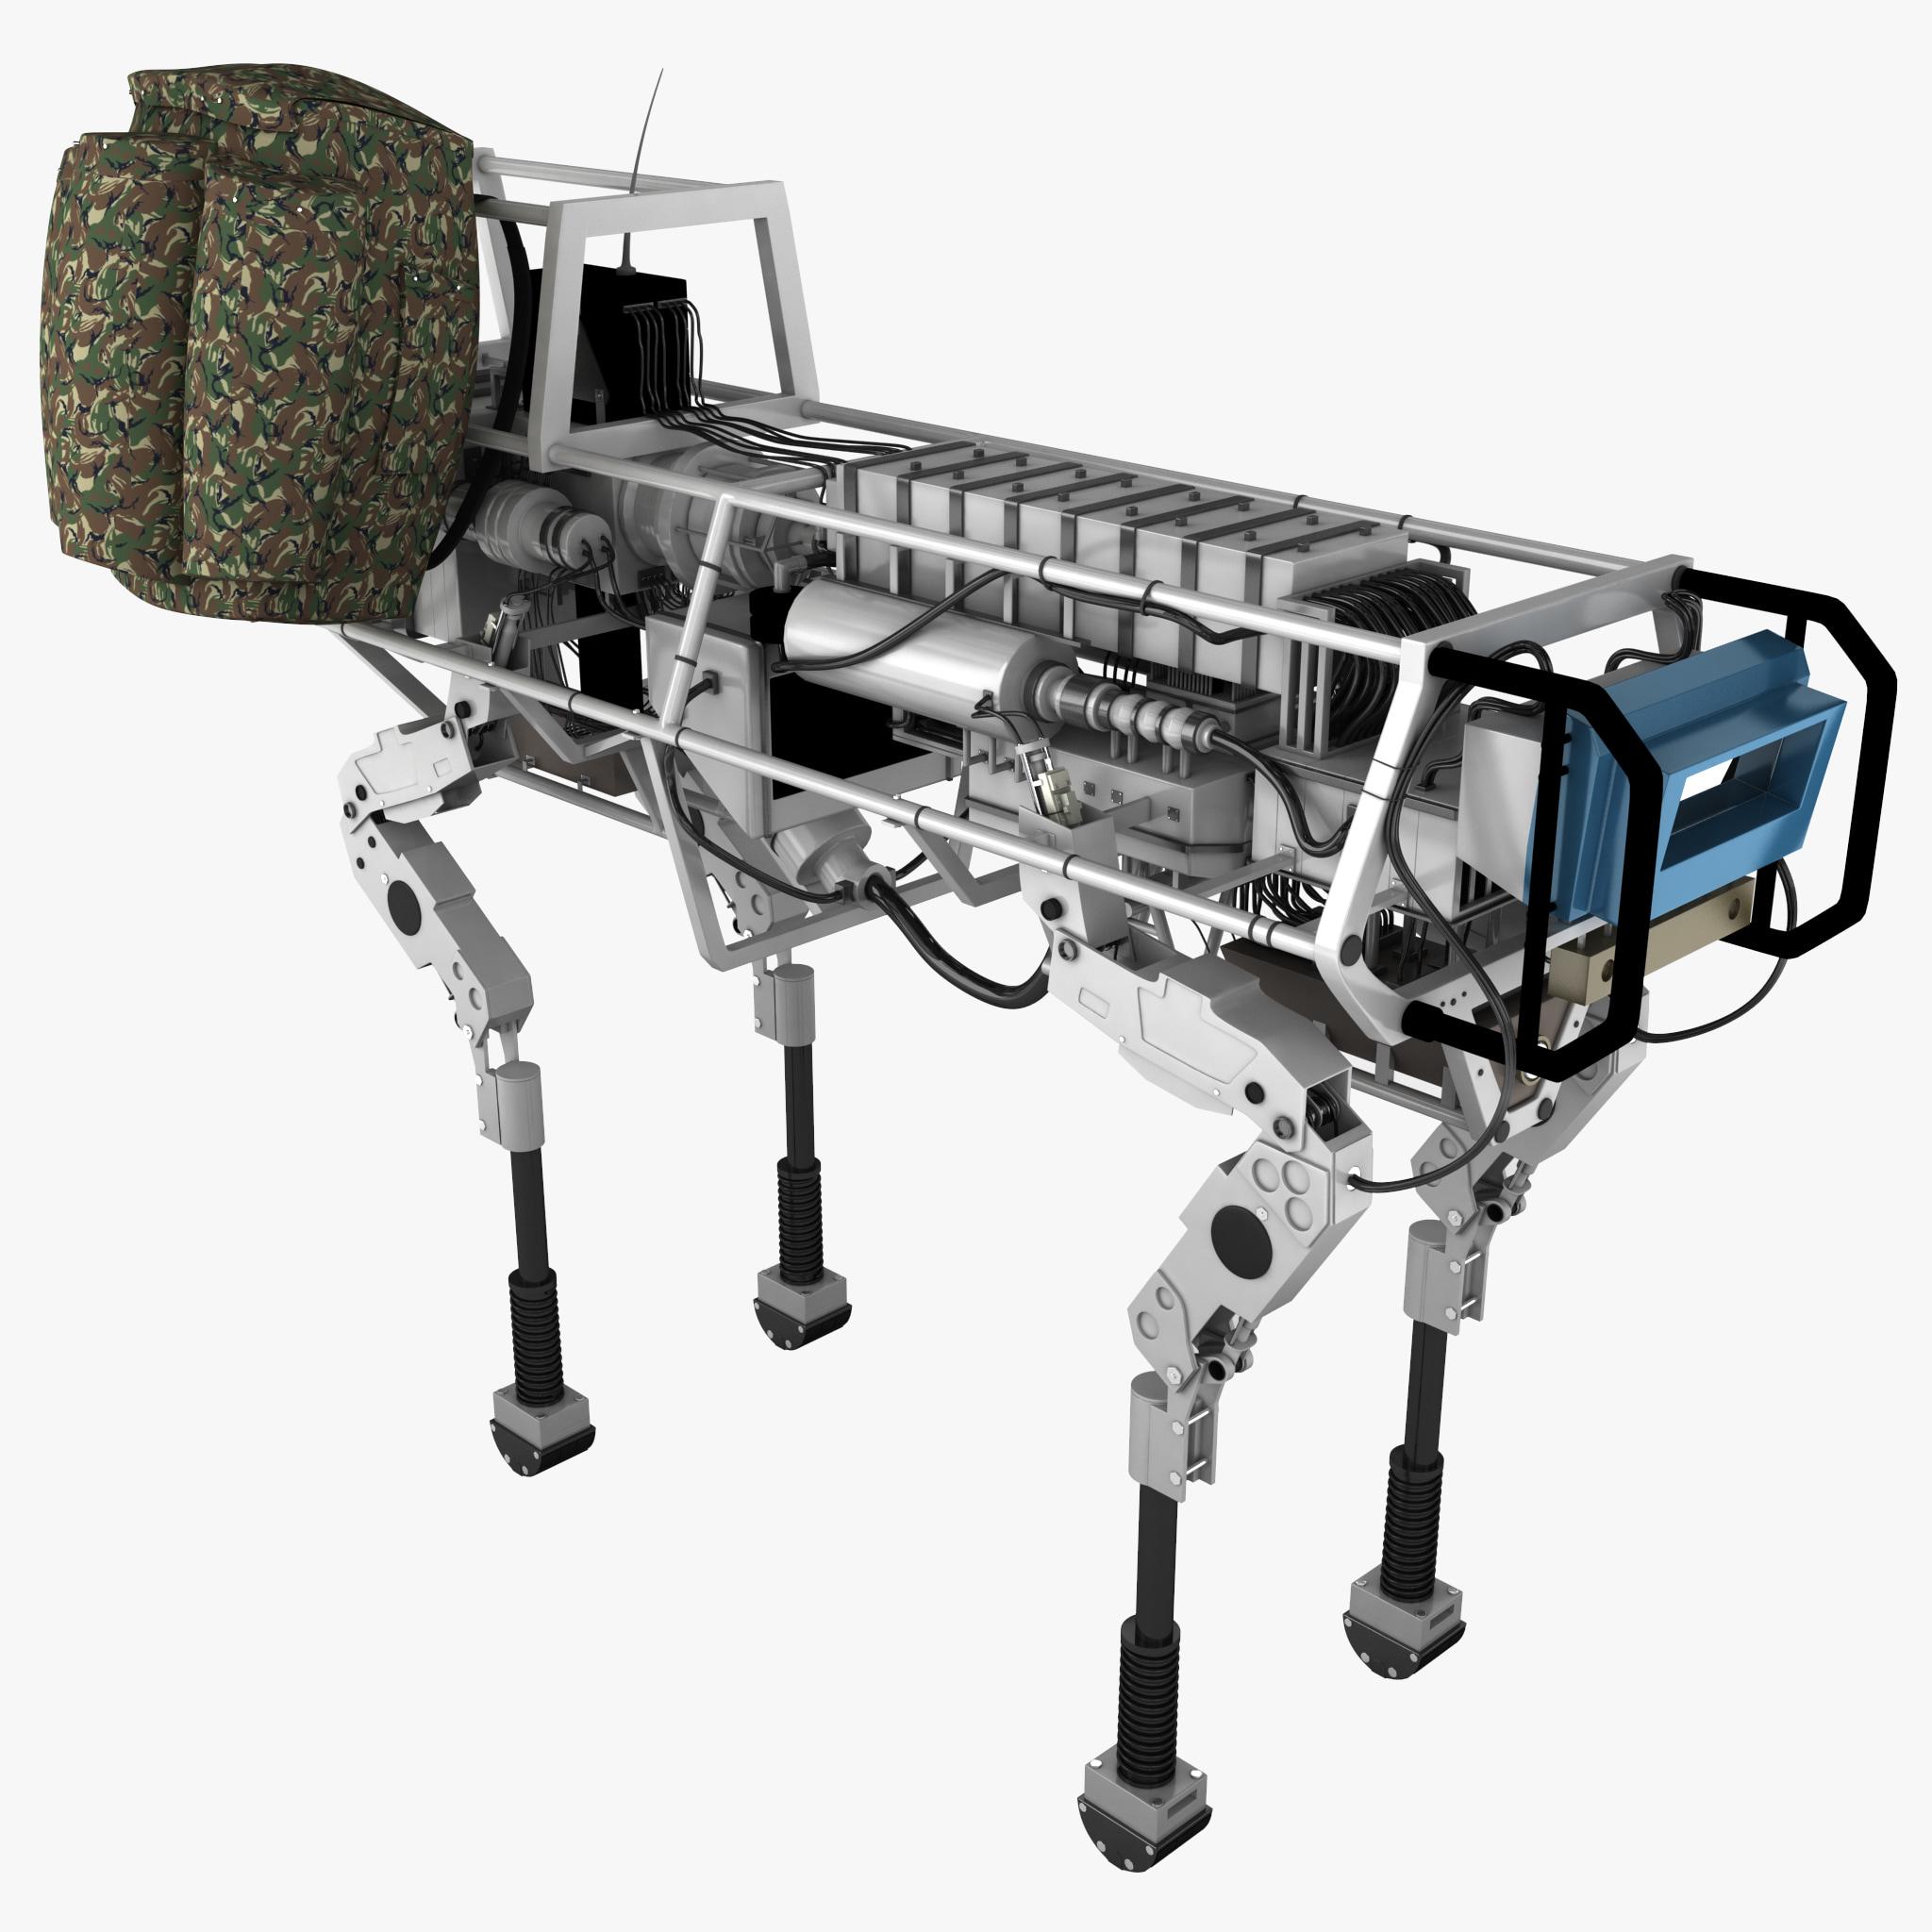 BigDog Military Robot_1.jpg